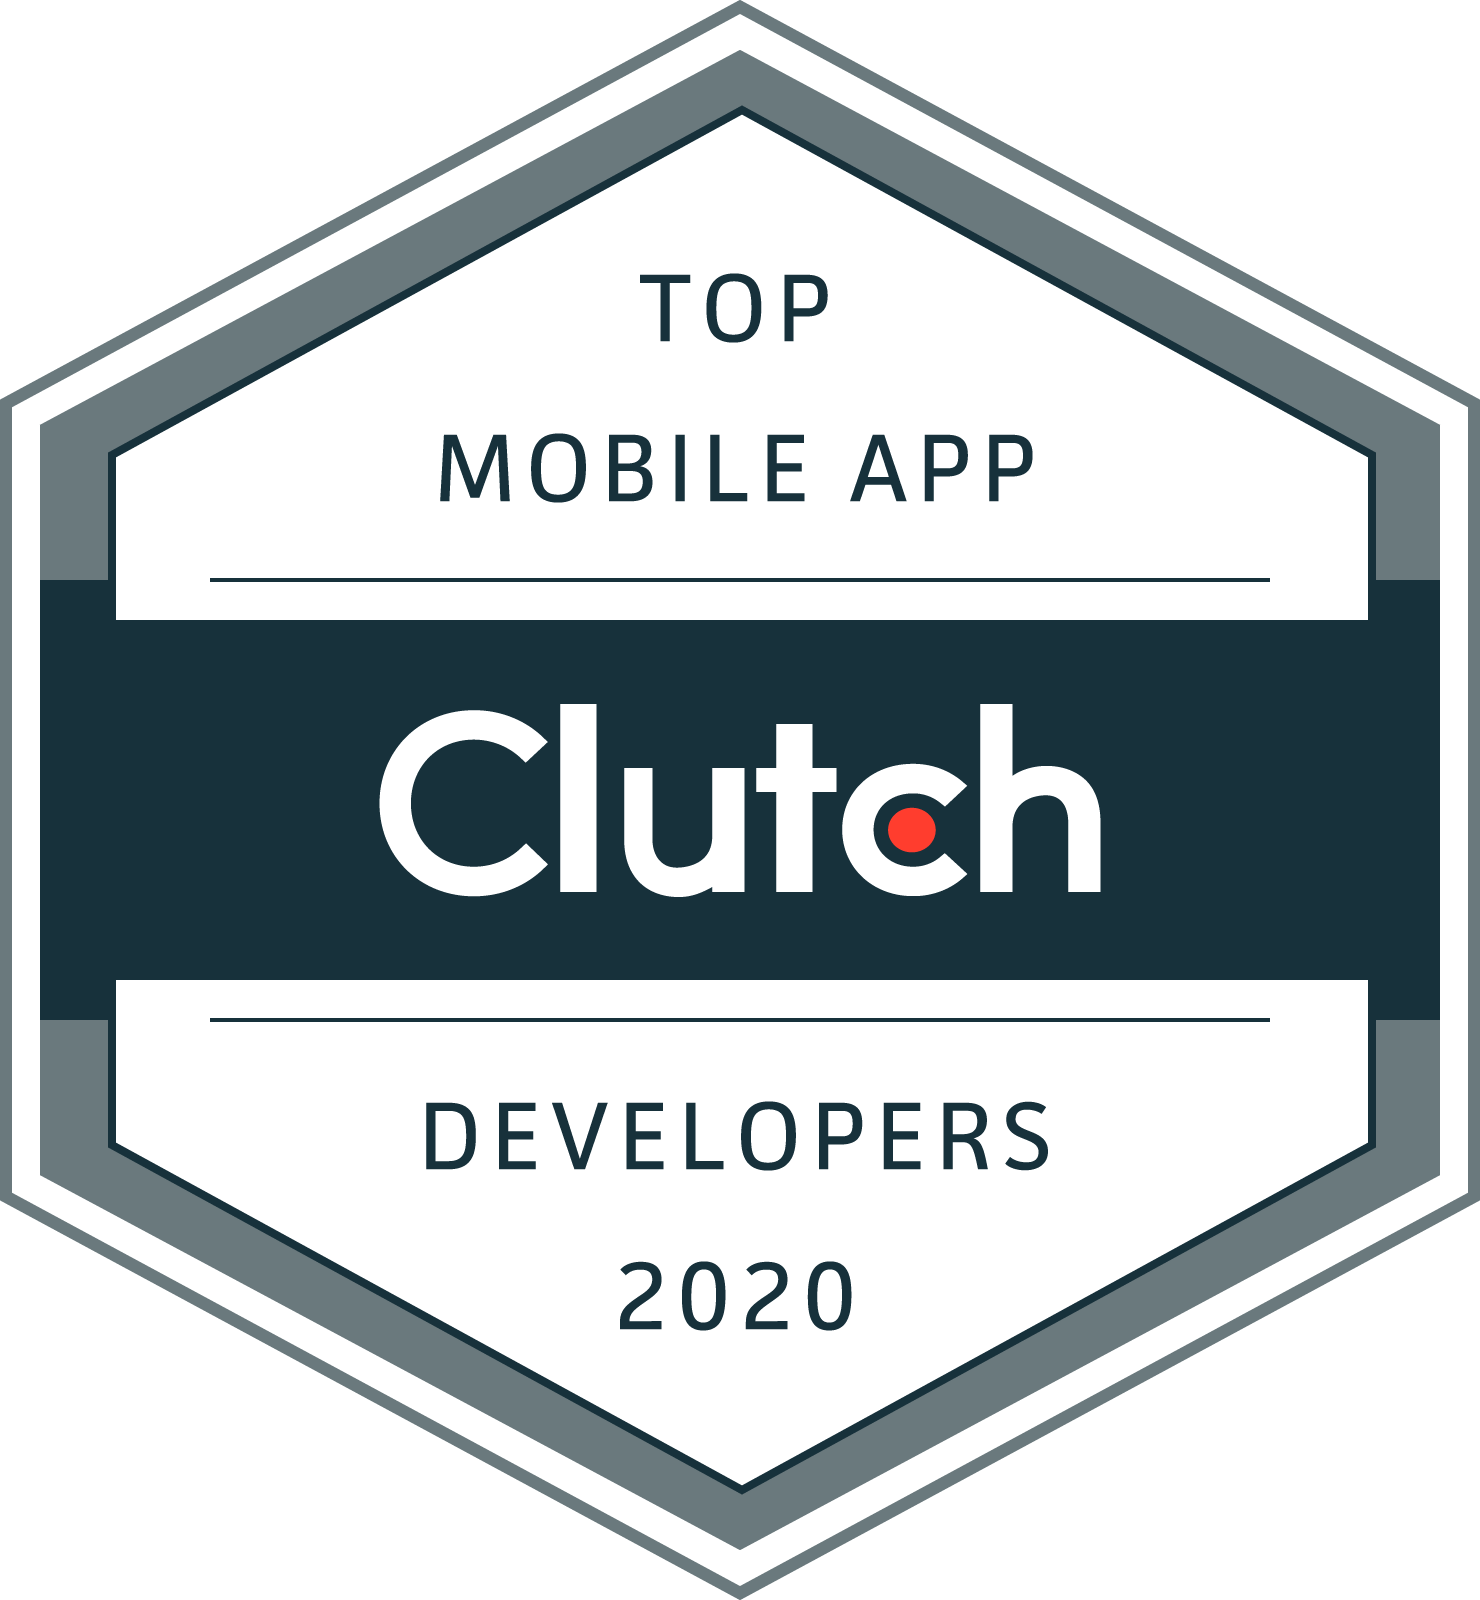 Clutch's Top Mobile App Developers 2020 badge